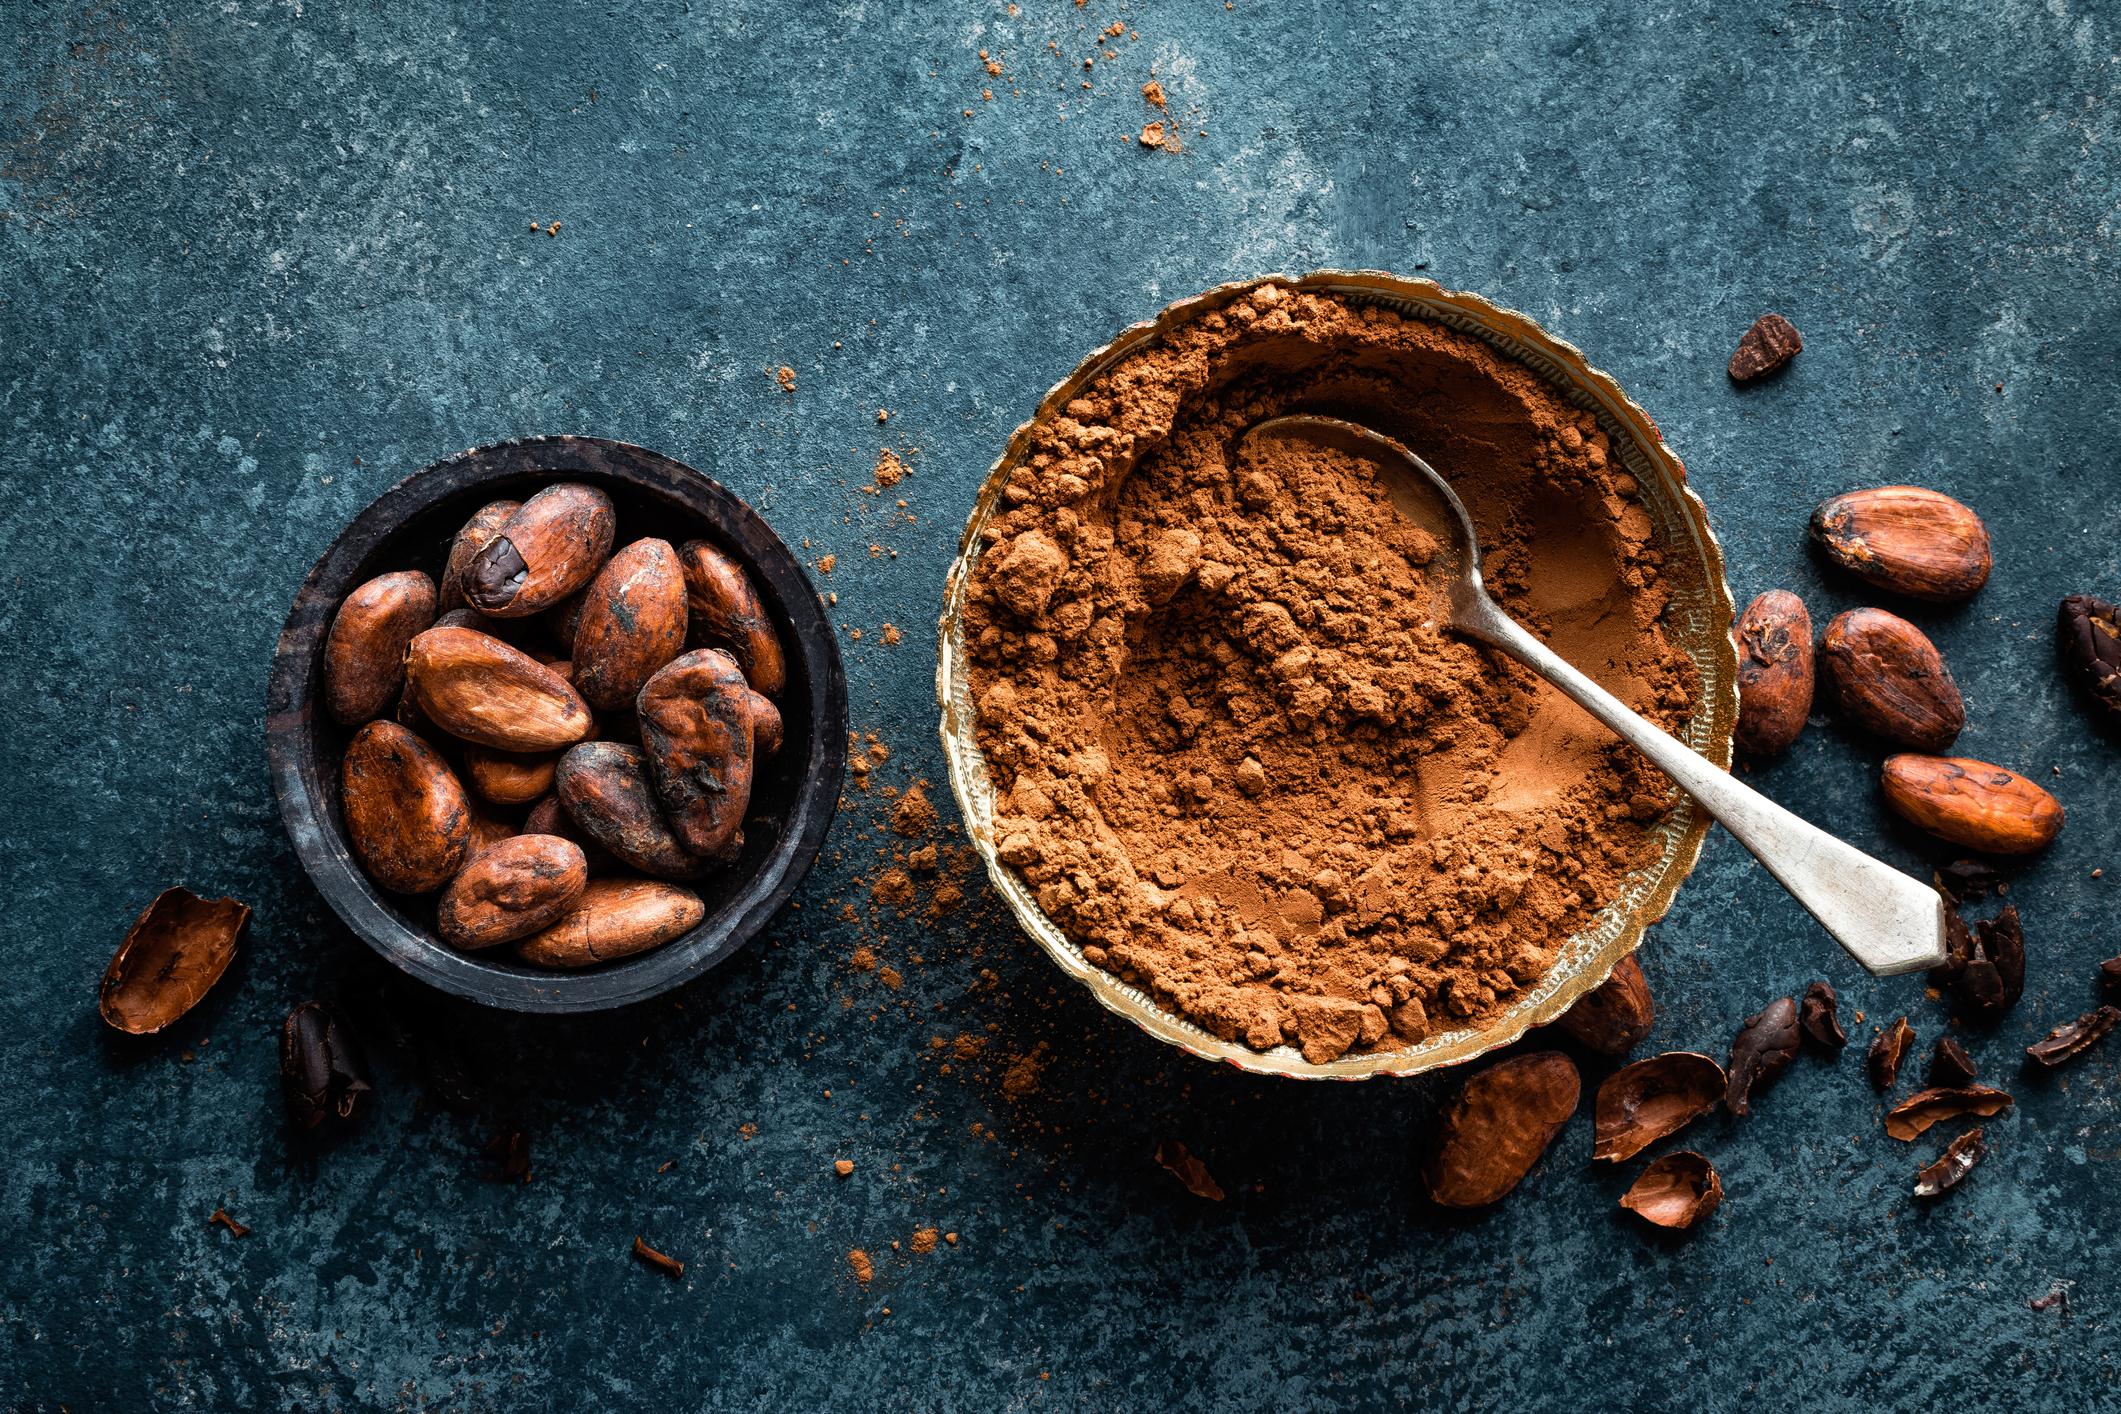 Go coo-coo for cocoa for a sharper, healthier brain